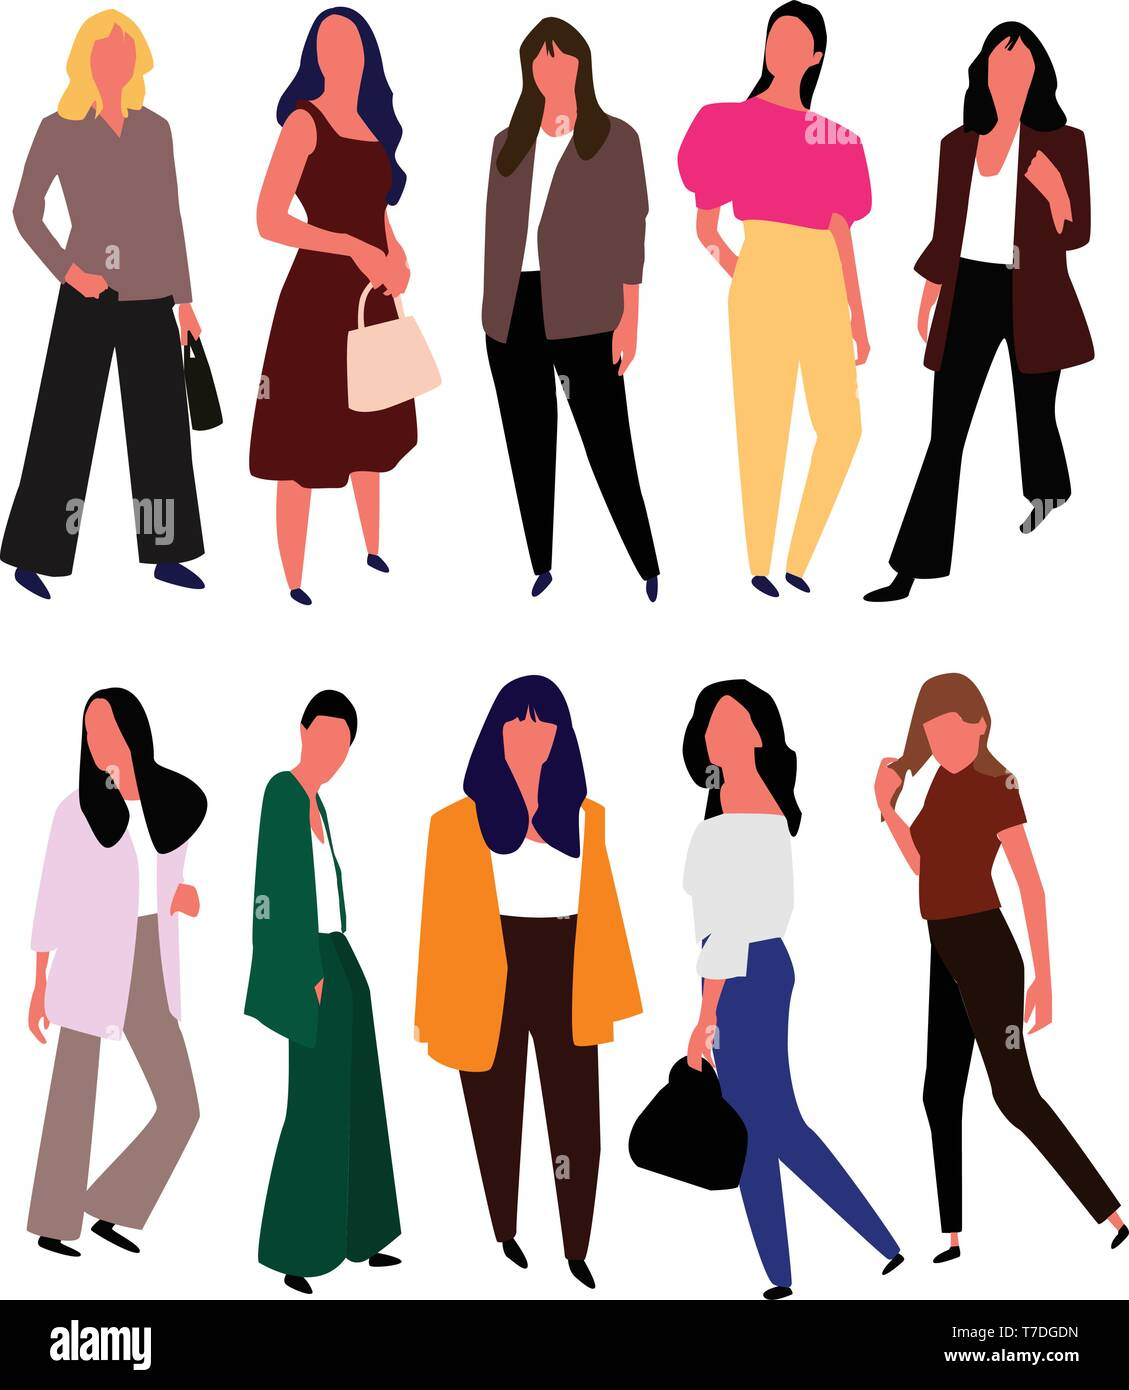 Schone Junge Frauen In Mode Kleidung Vektor Stock Vektorgrafik Alamy